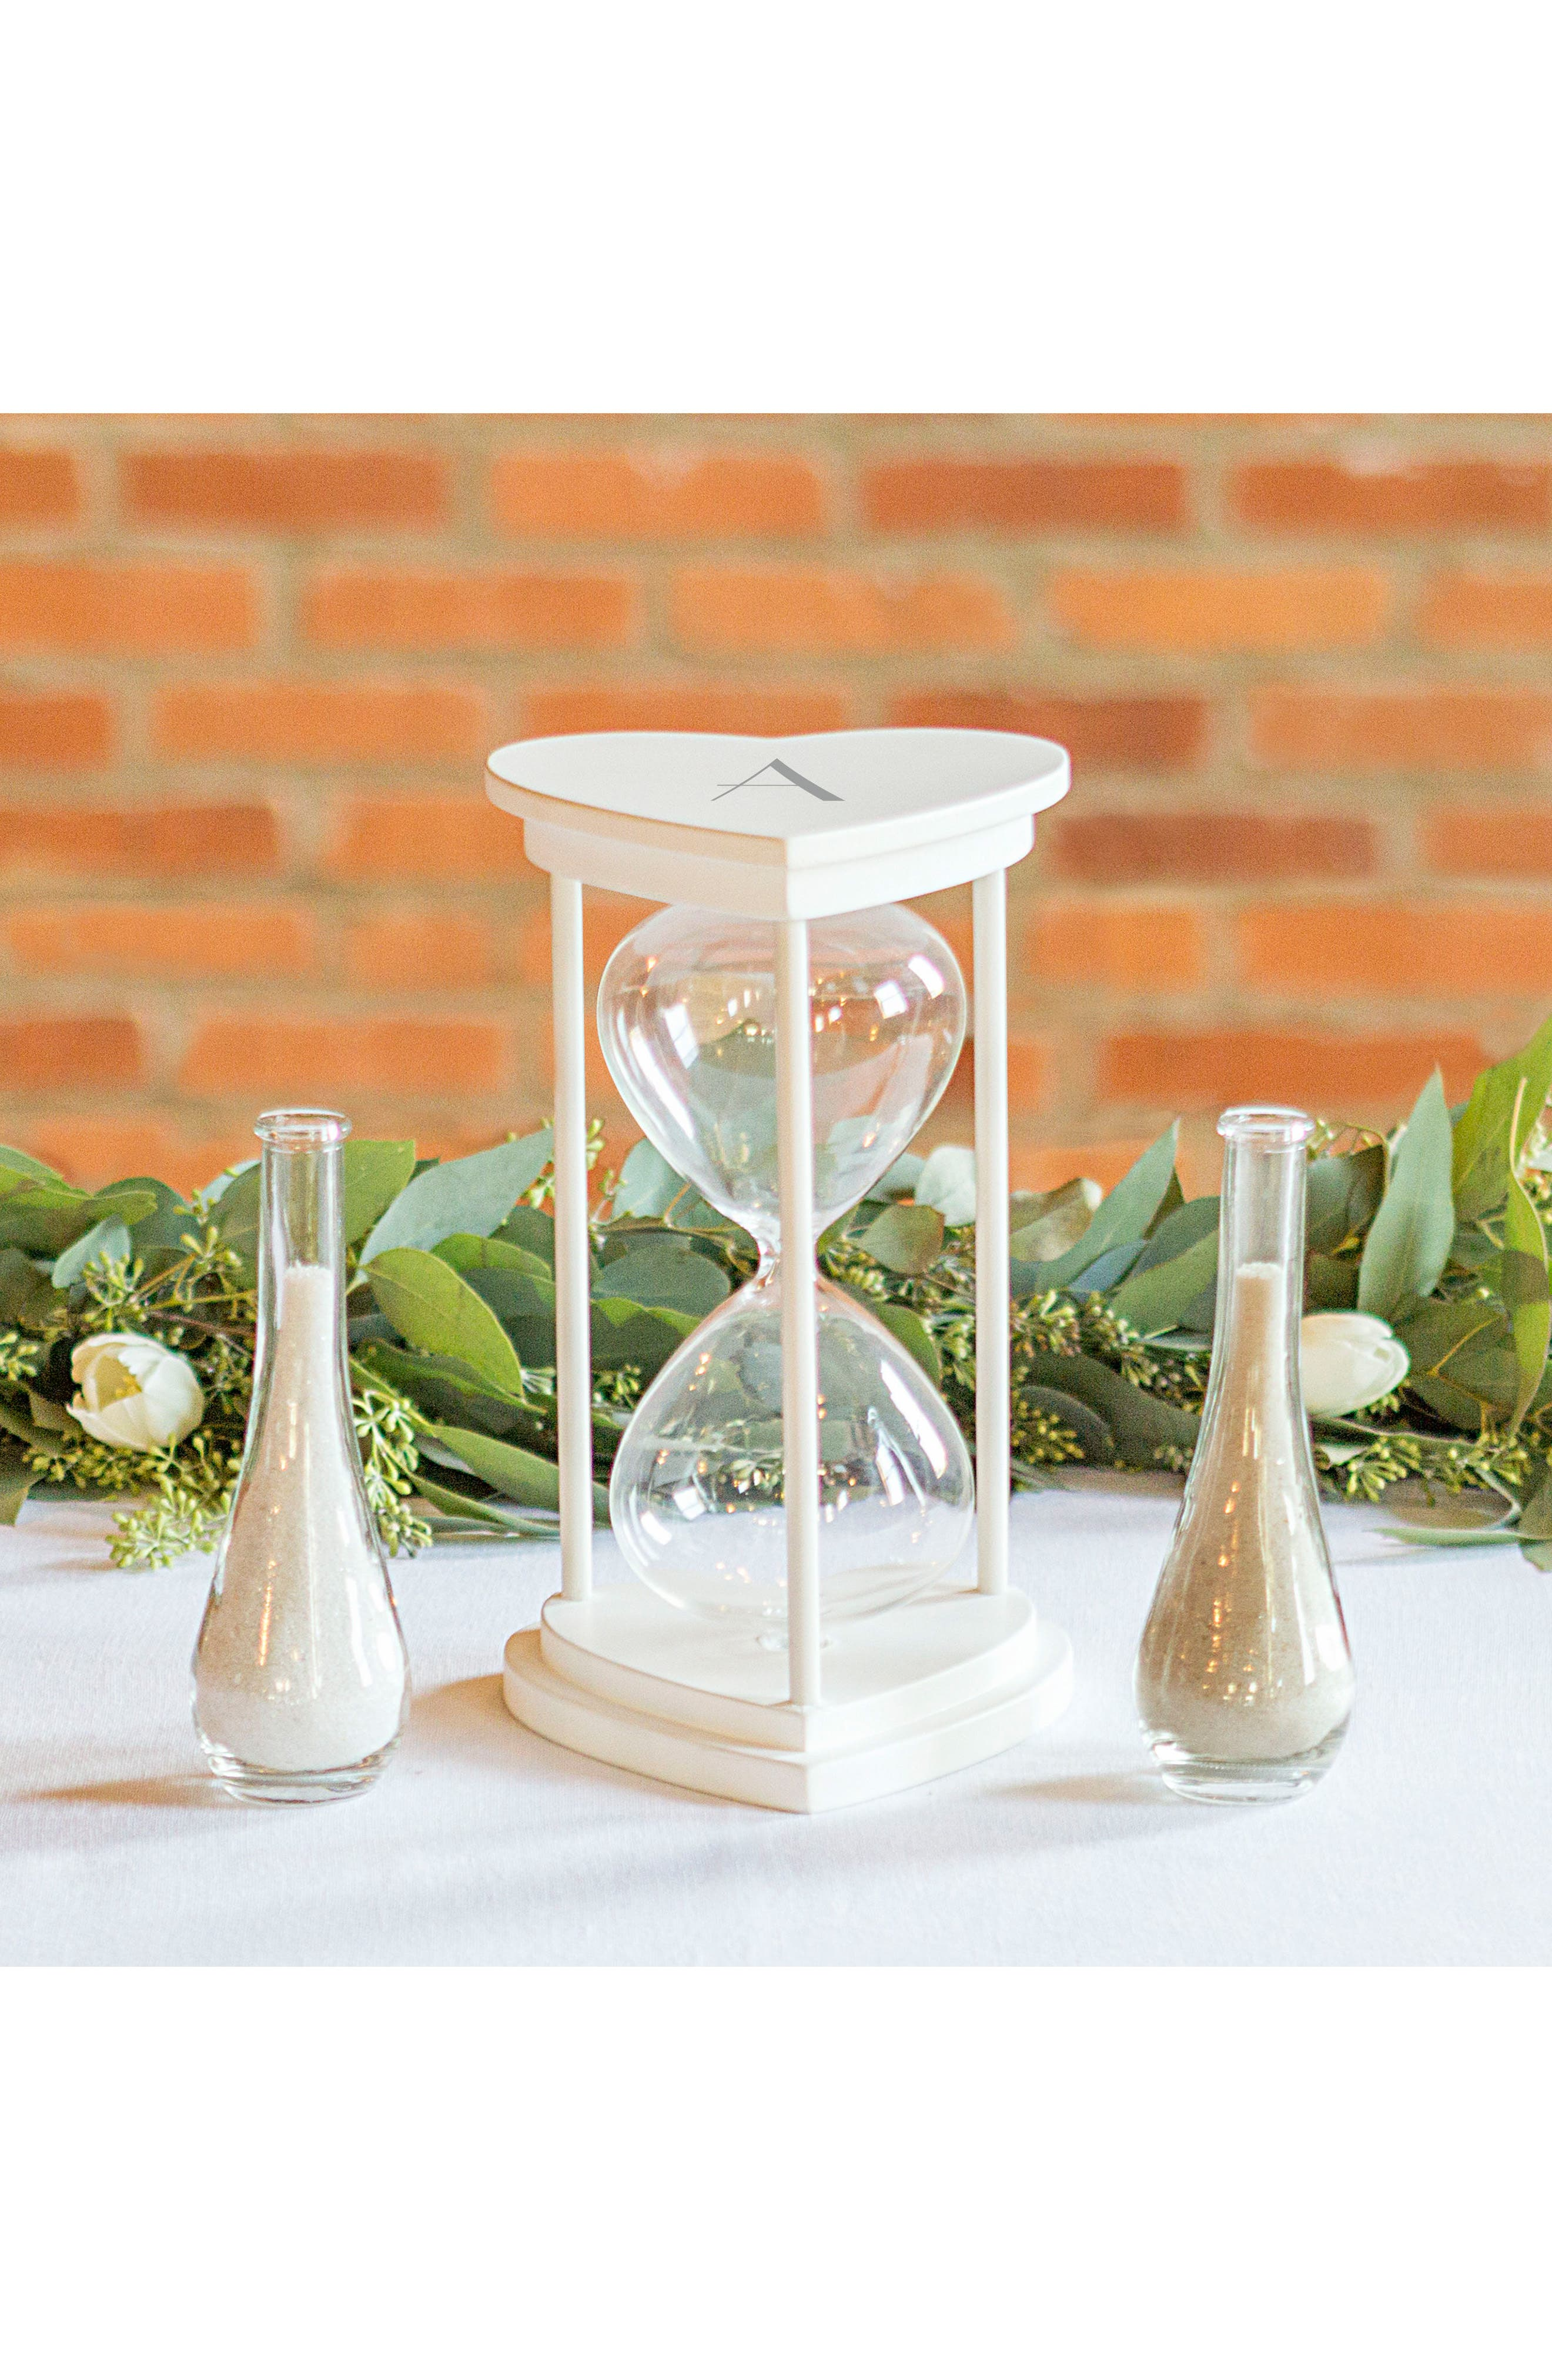 Monogram Unity Sand Ceremony Hourglass Set,                             Alternate thumbnail 6, color,